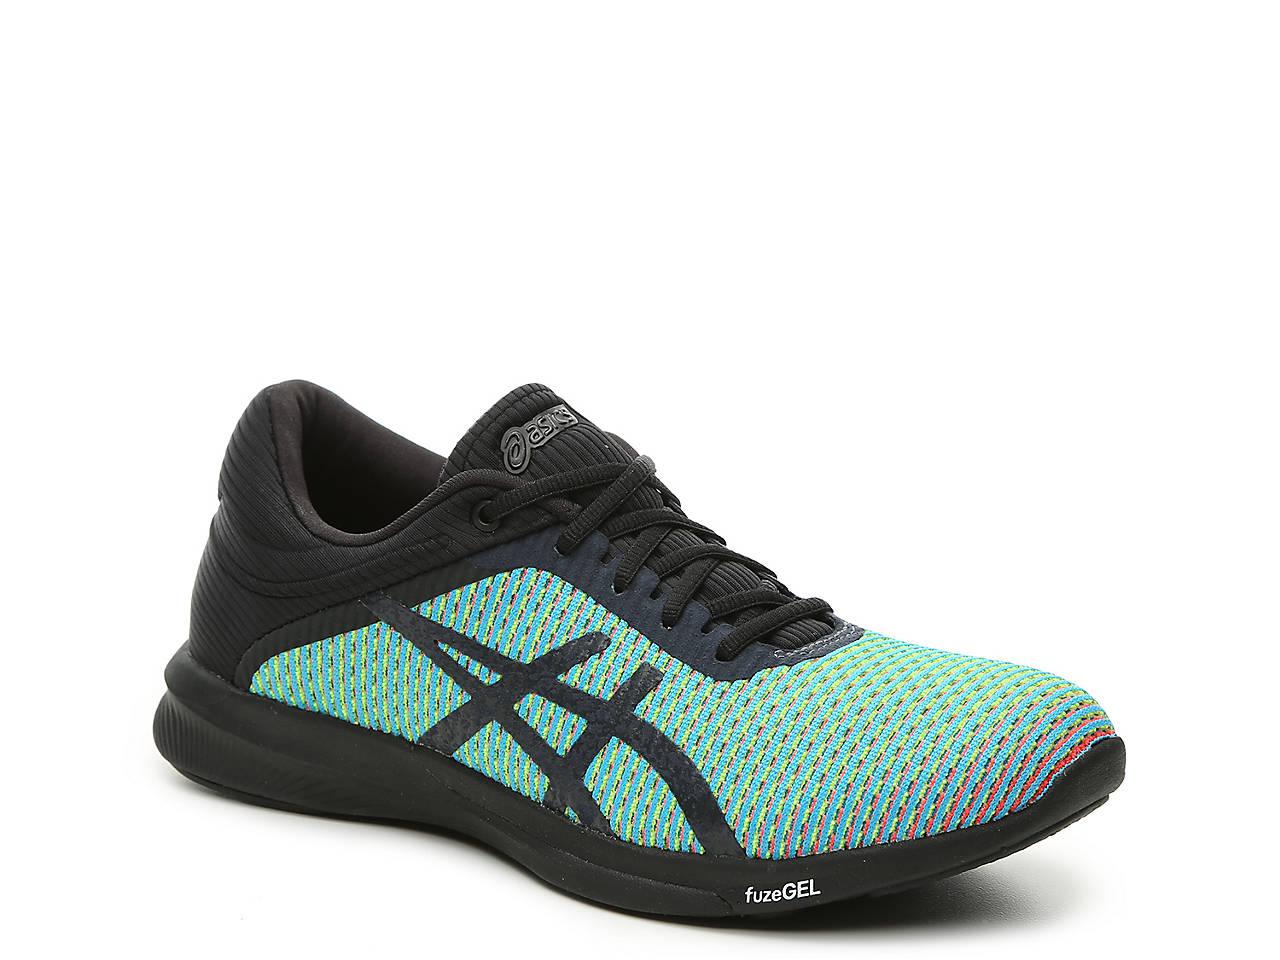 nouveau produit f2440 00ead FuzeX Rush Lightweight Running Shoe - Women's